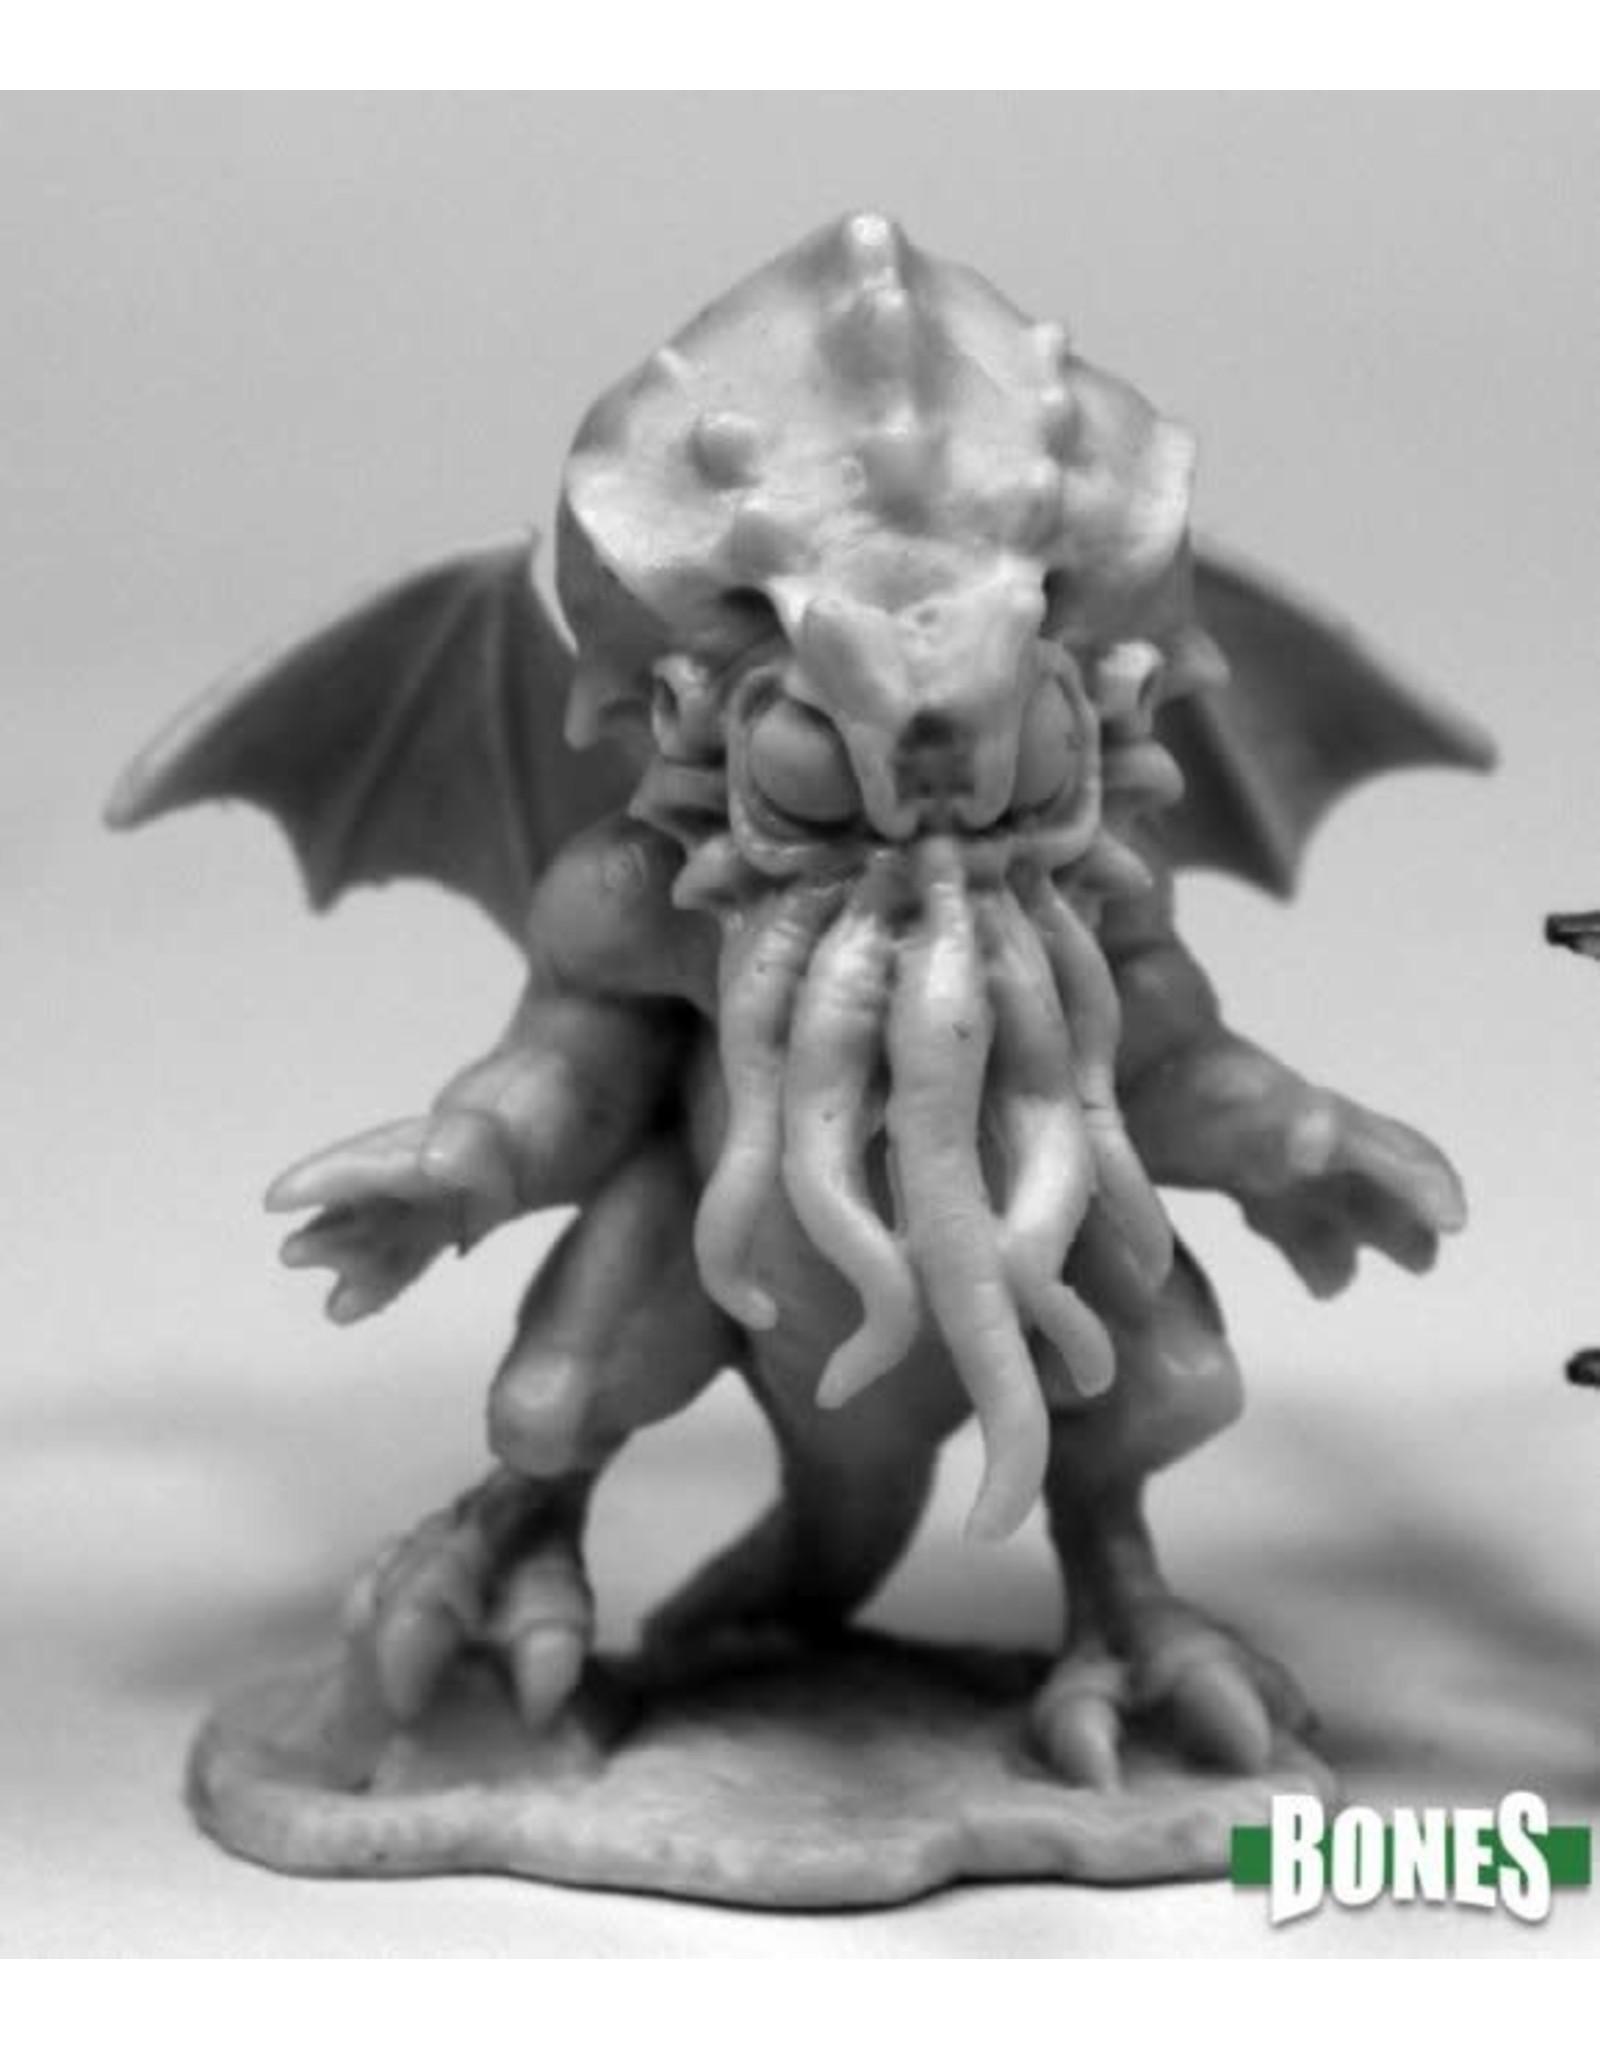 Reaper Miniatures Bones Bonesylvanians - Lou